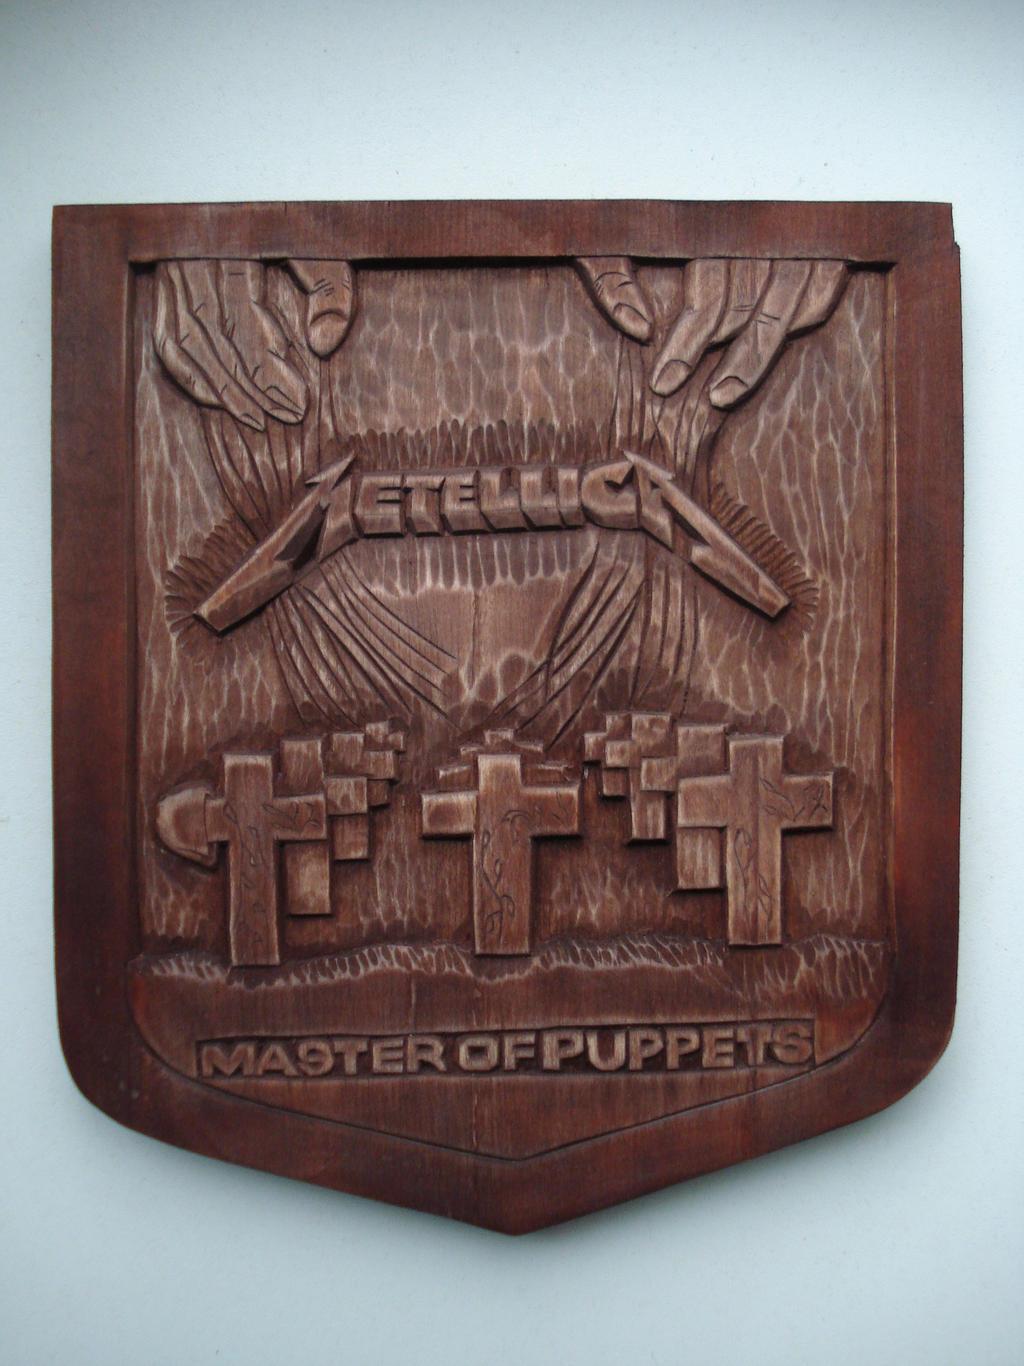 Metallica logo made from wood by edwardwoodart on deviantart